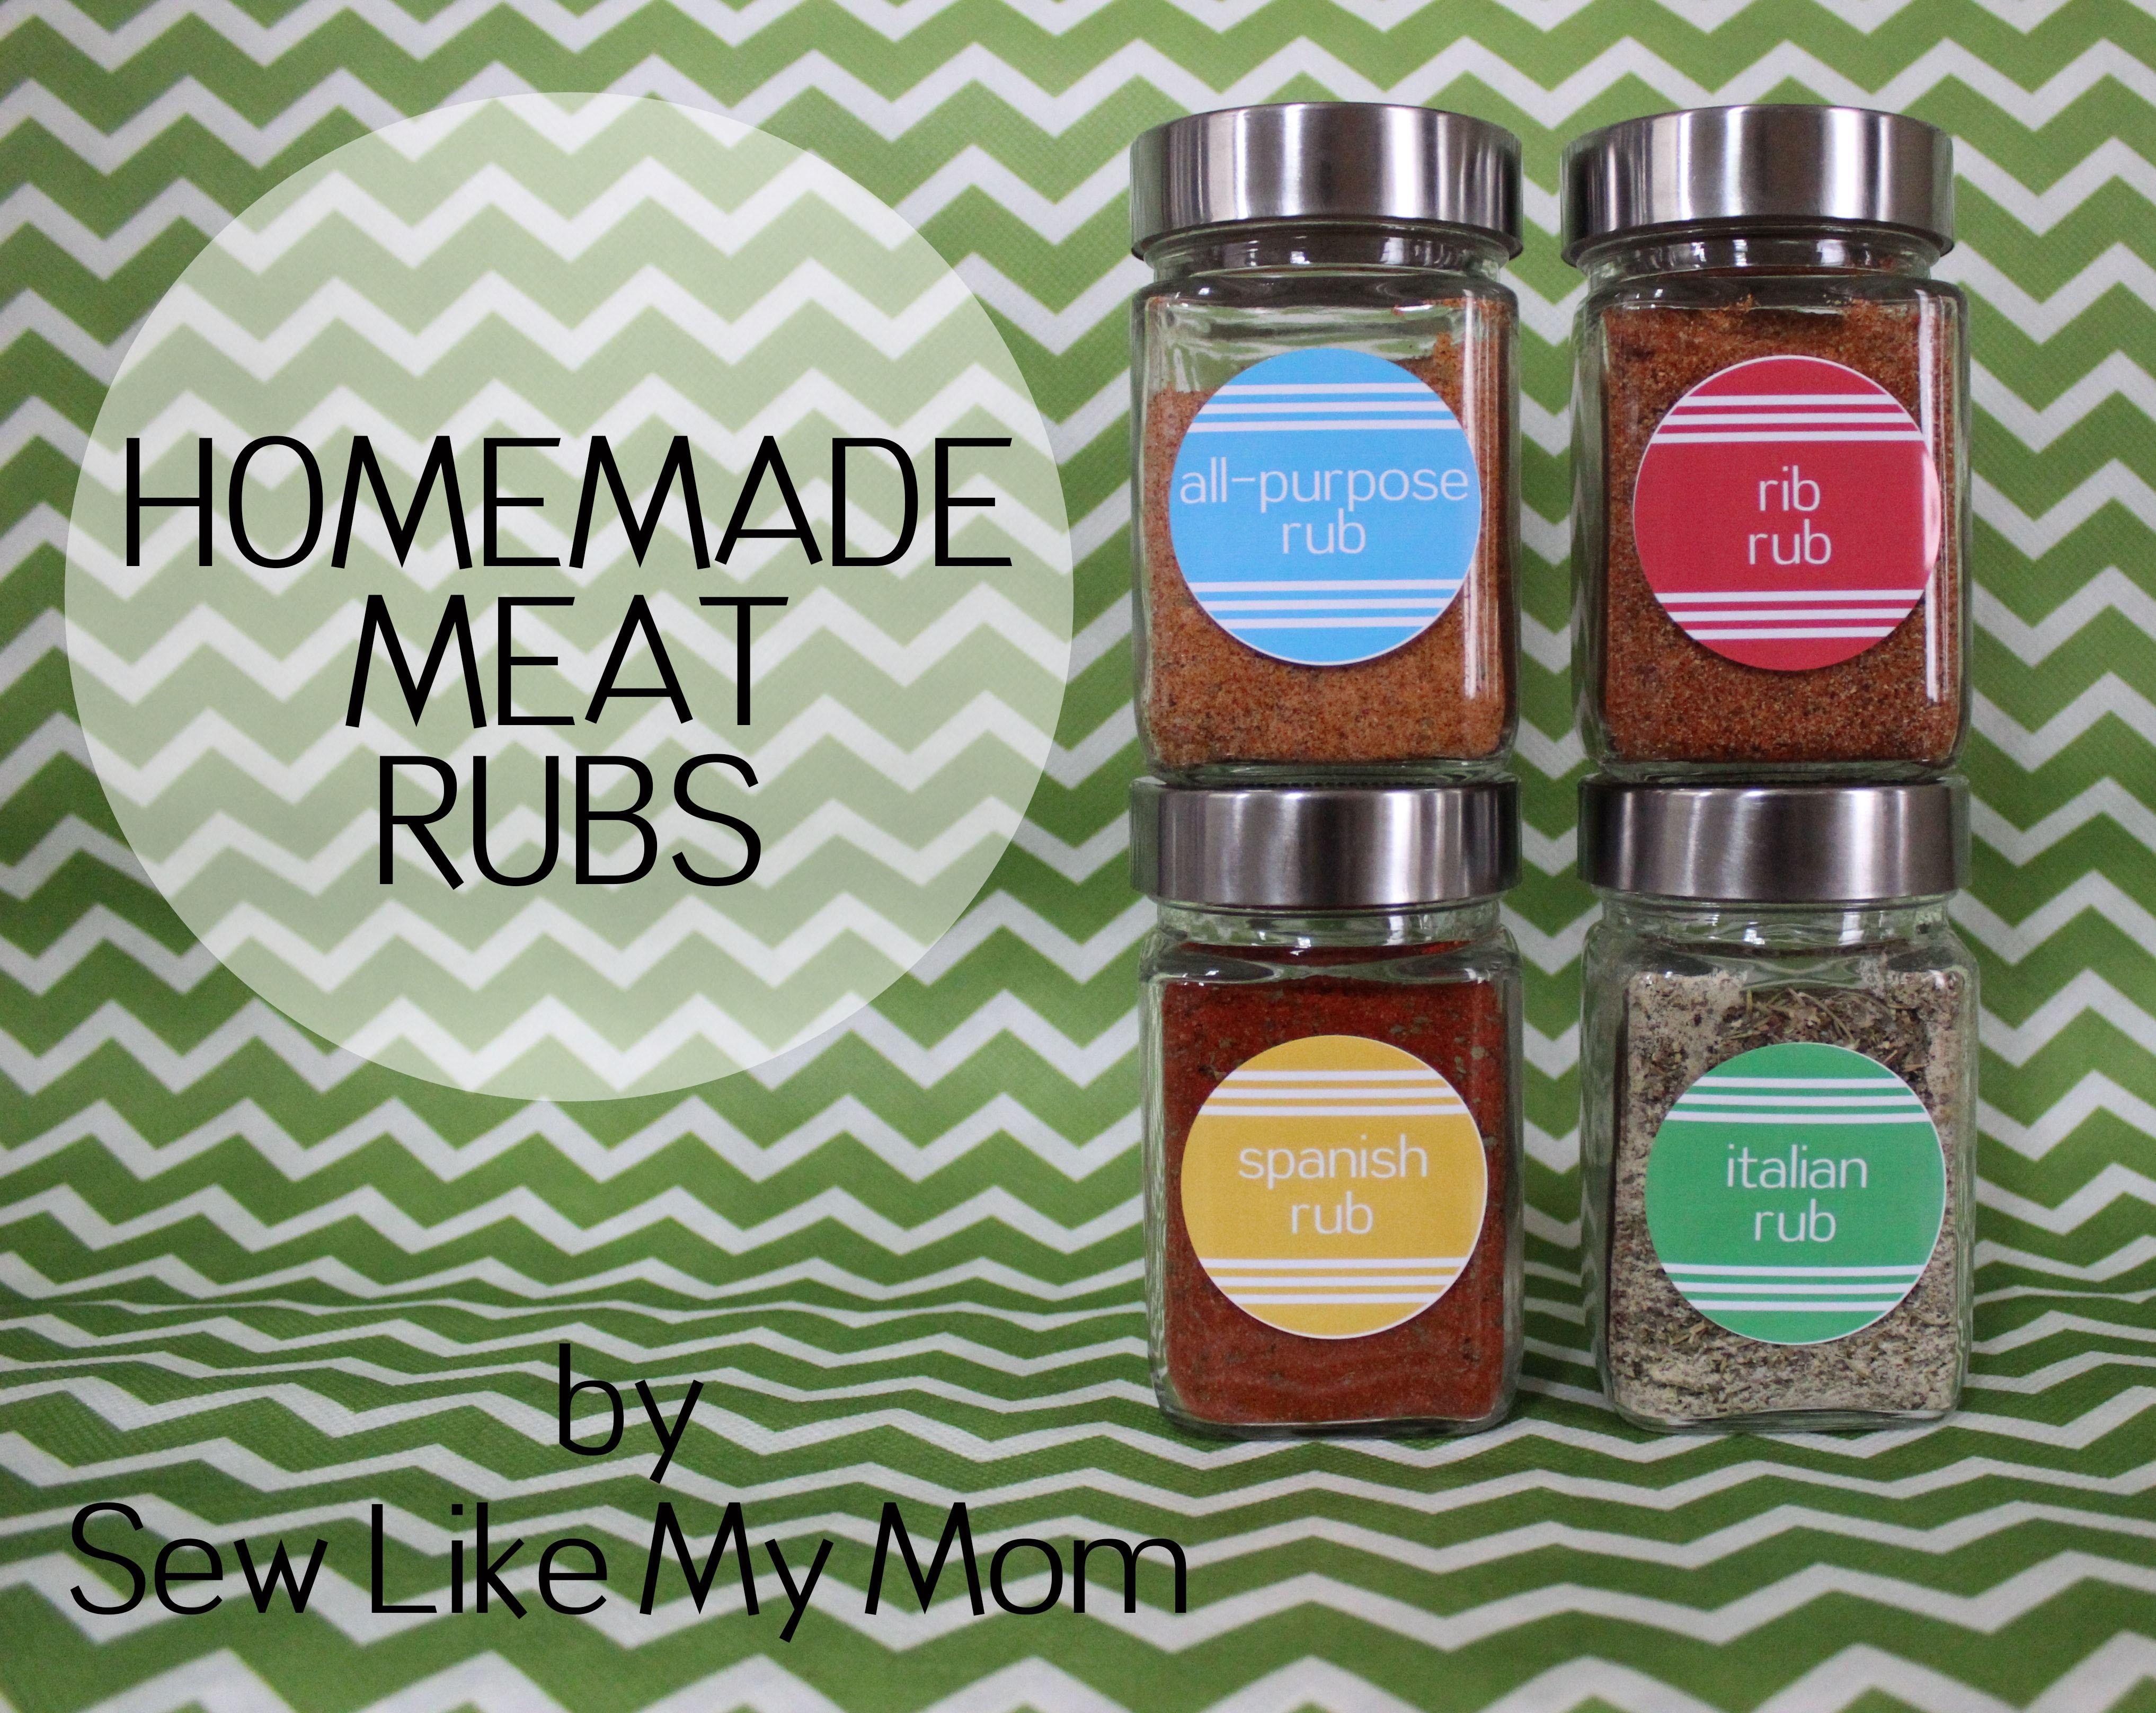 Sew Like My Mom | Homemade Meat Rubs